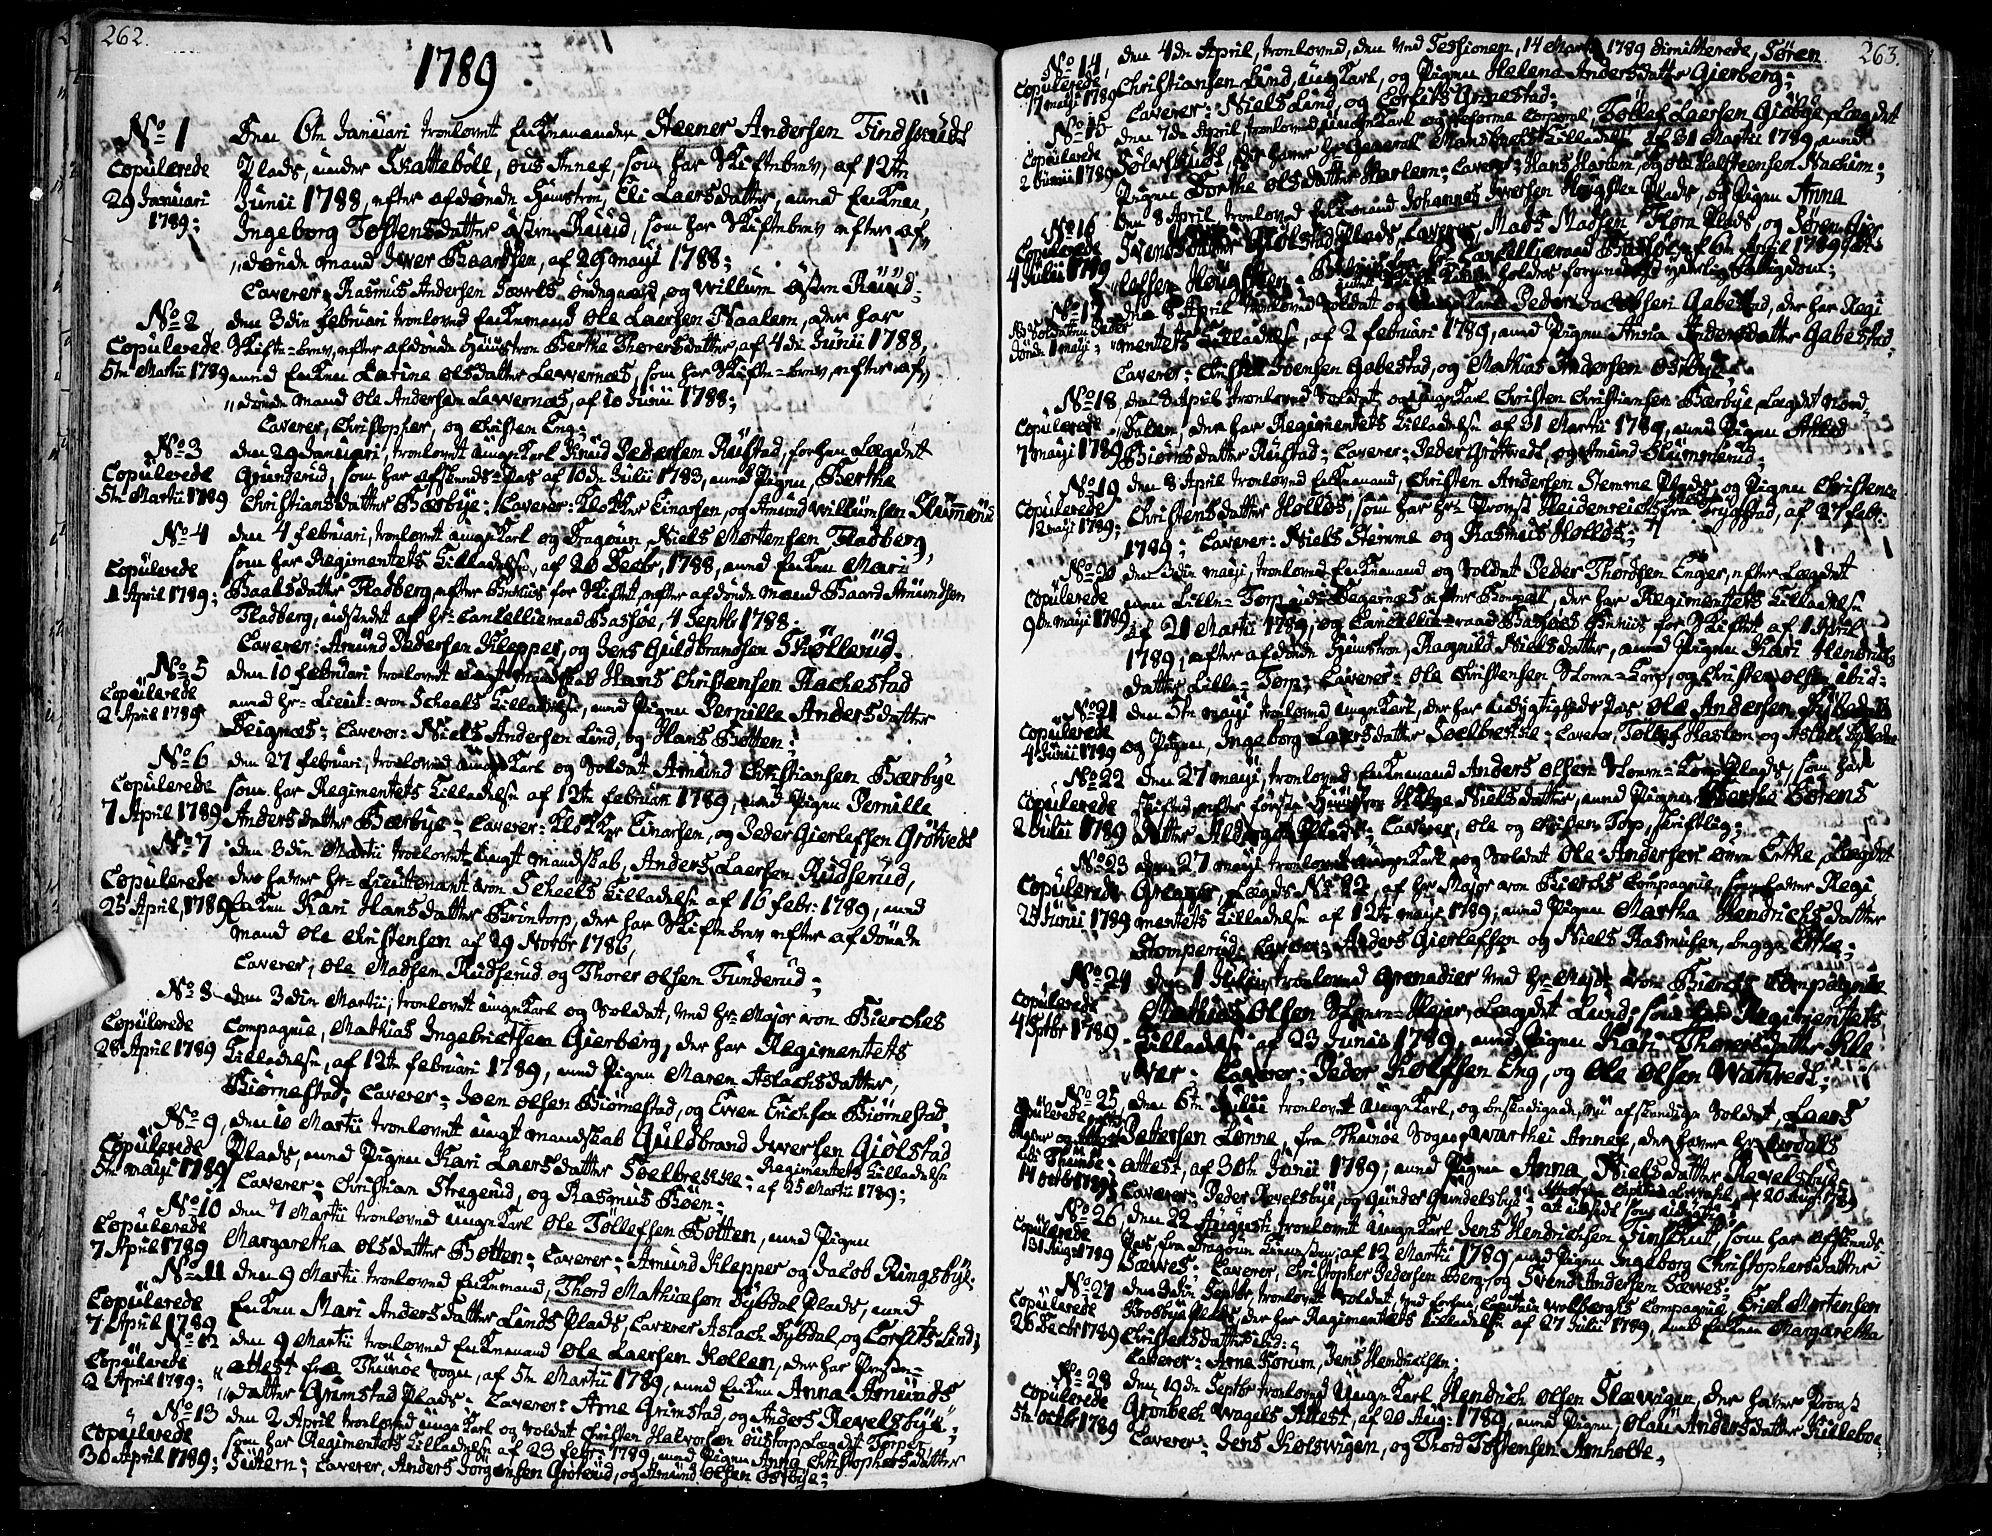 SAO, Rakkestad prestekontor Kirkebøker, F/Fa/L0005: Ministerialbok nr. I 5, 1784-1814, s. 262-263